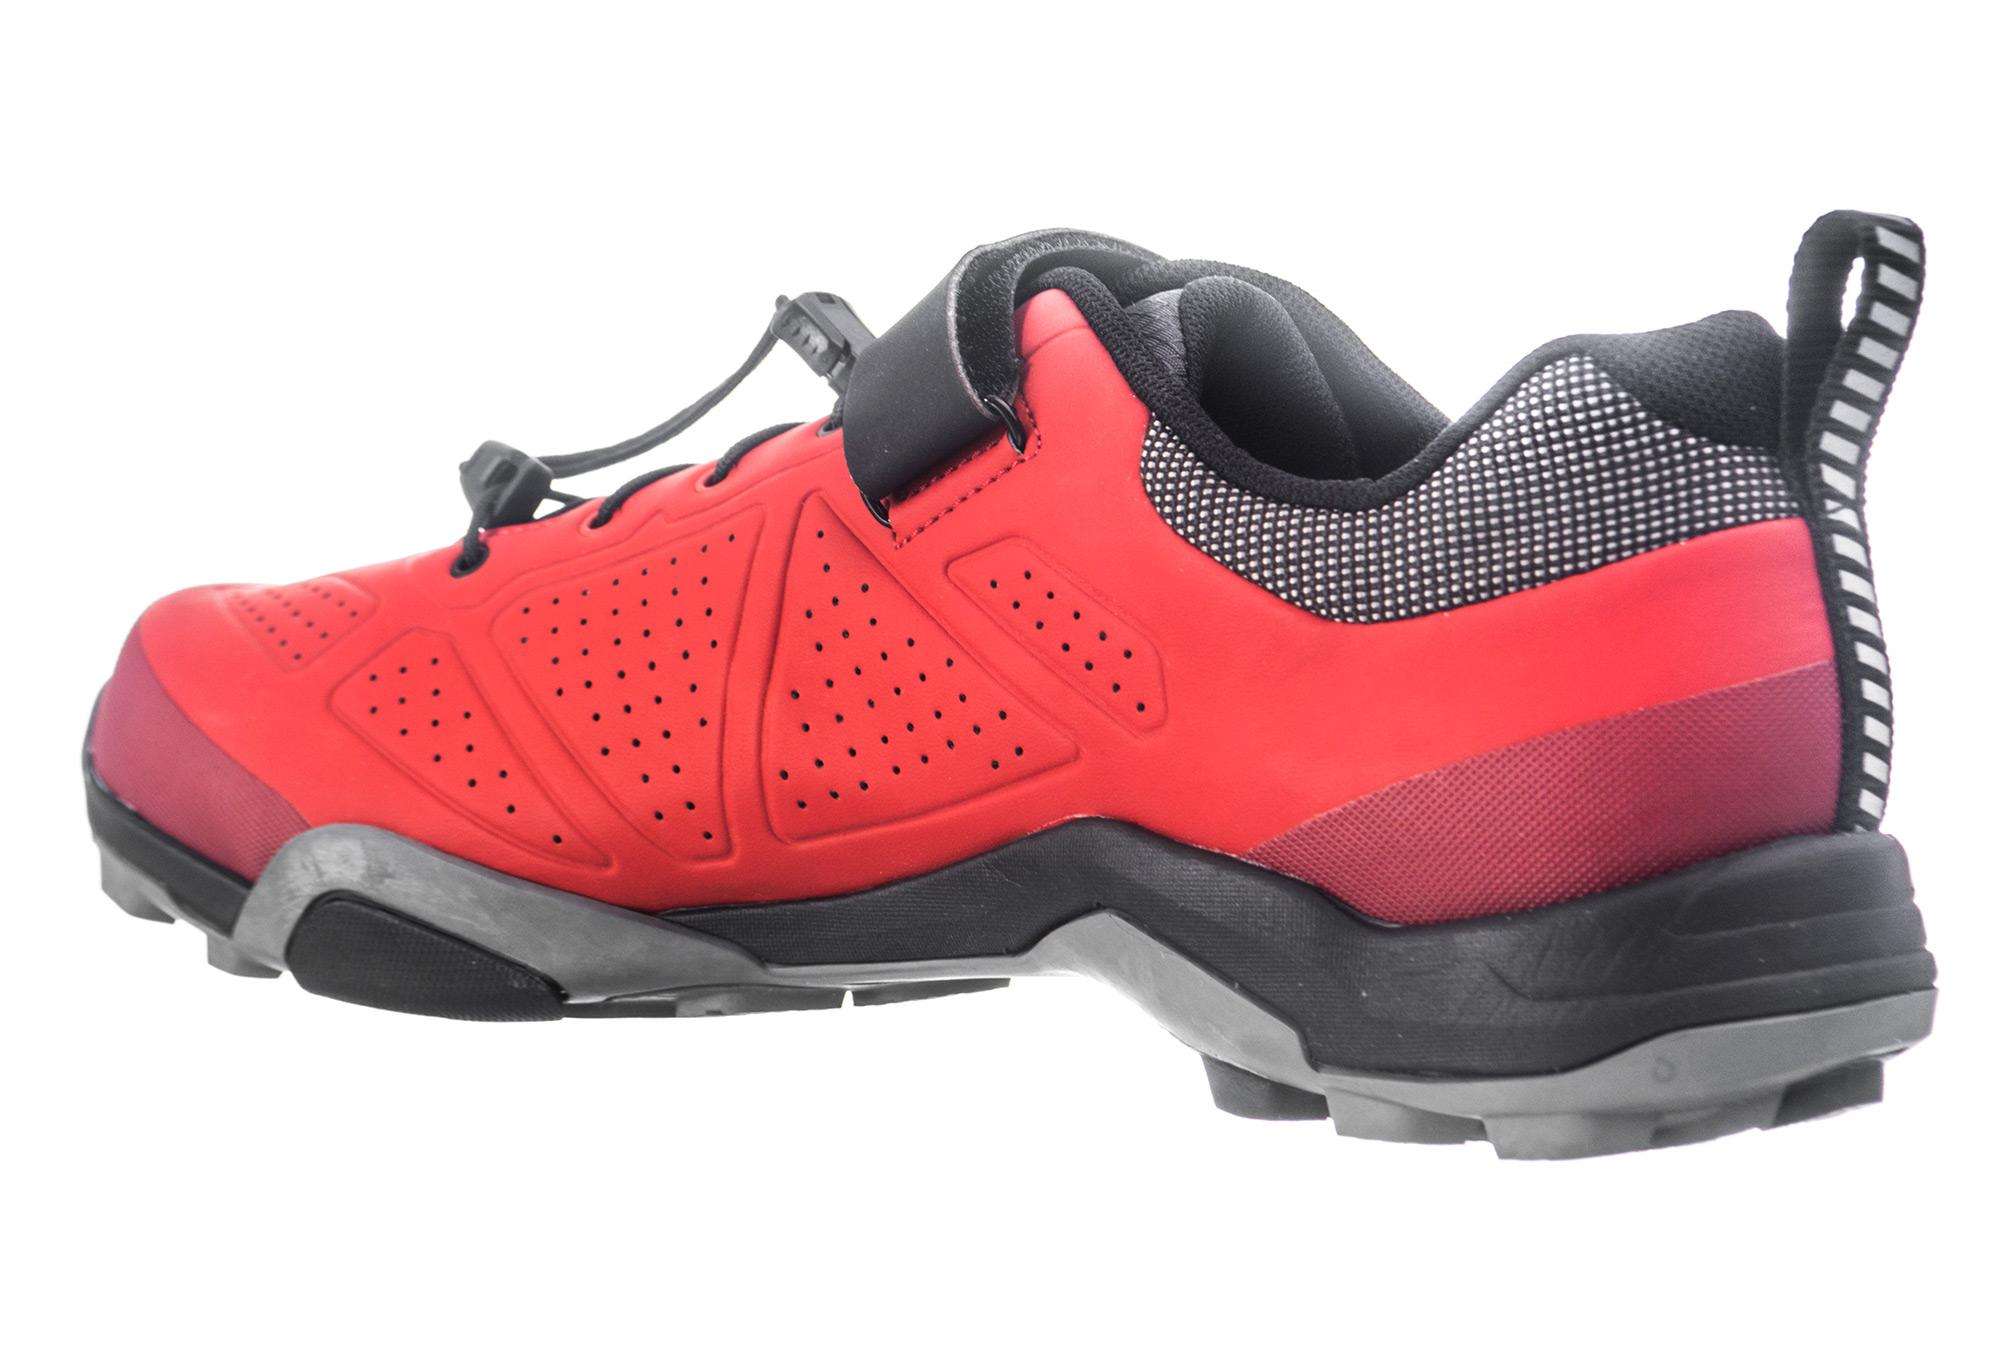 Vtt De Rouge Shimano Mt500 Paire Chaussures XuPZOkwTil